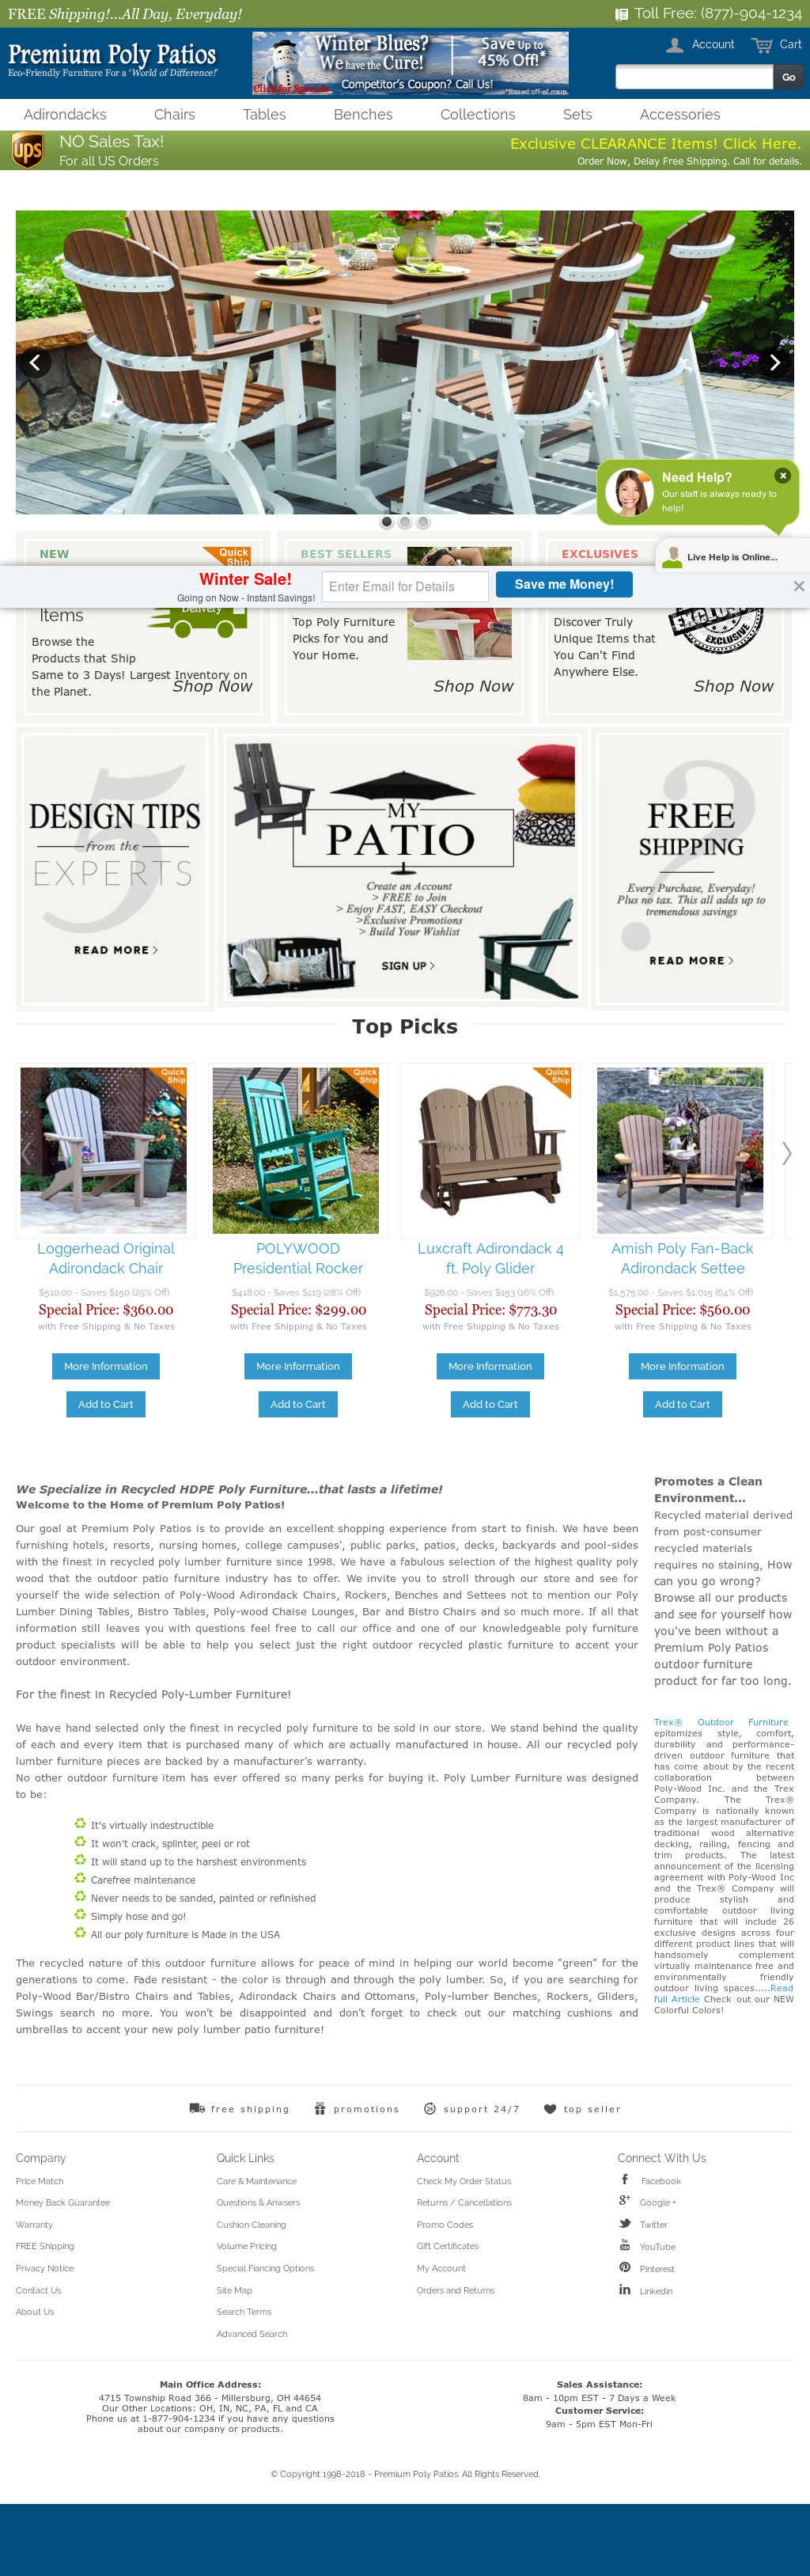 Premium Poly Patios Website History